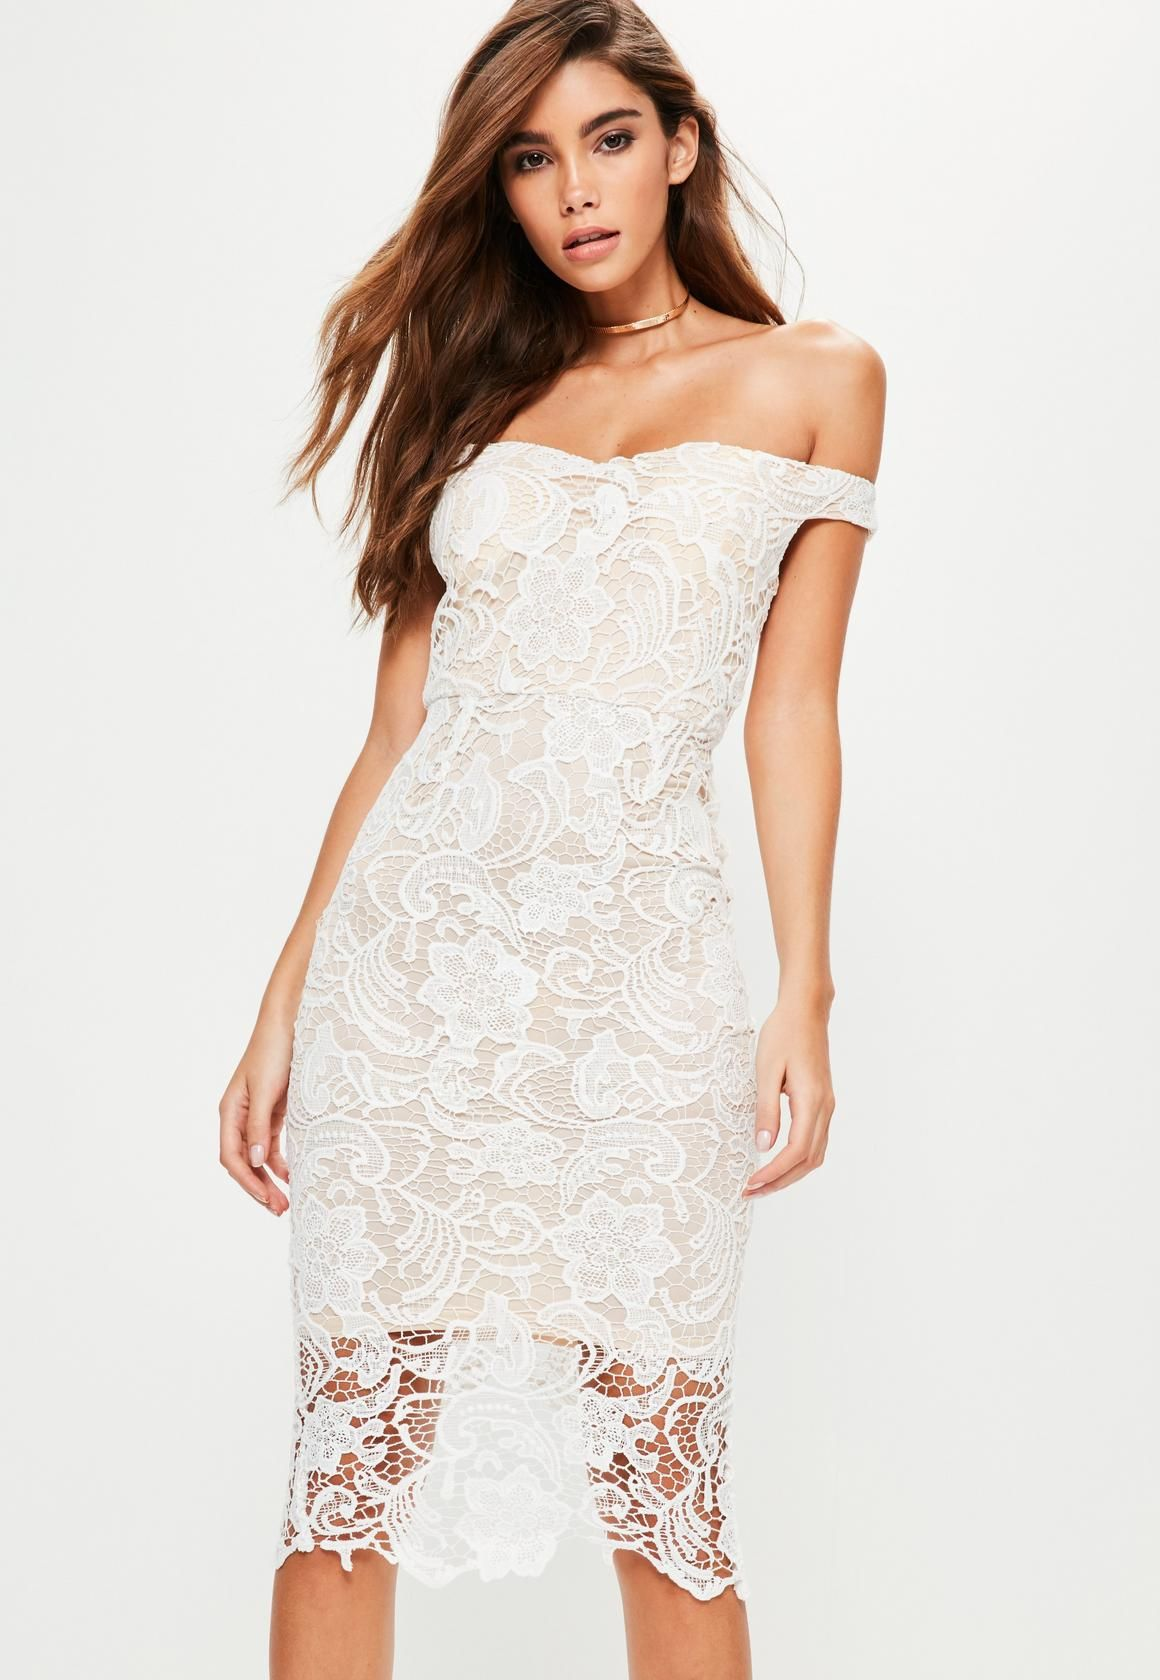 543d2ca0448b Missguided - White Lace Bardot Midi Dress | Stephanie | Bardot midi ...